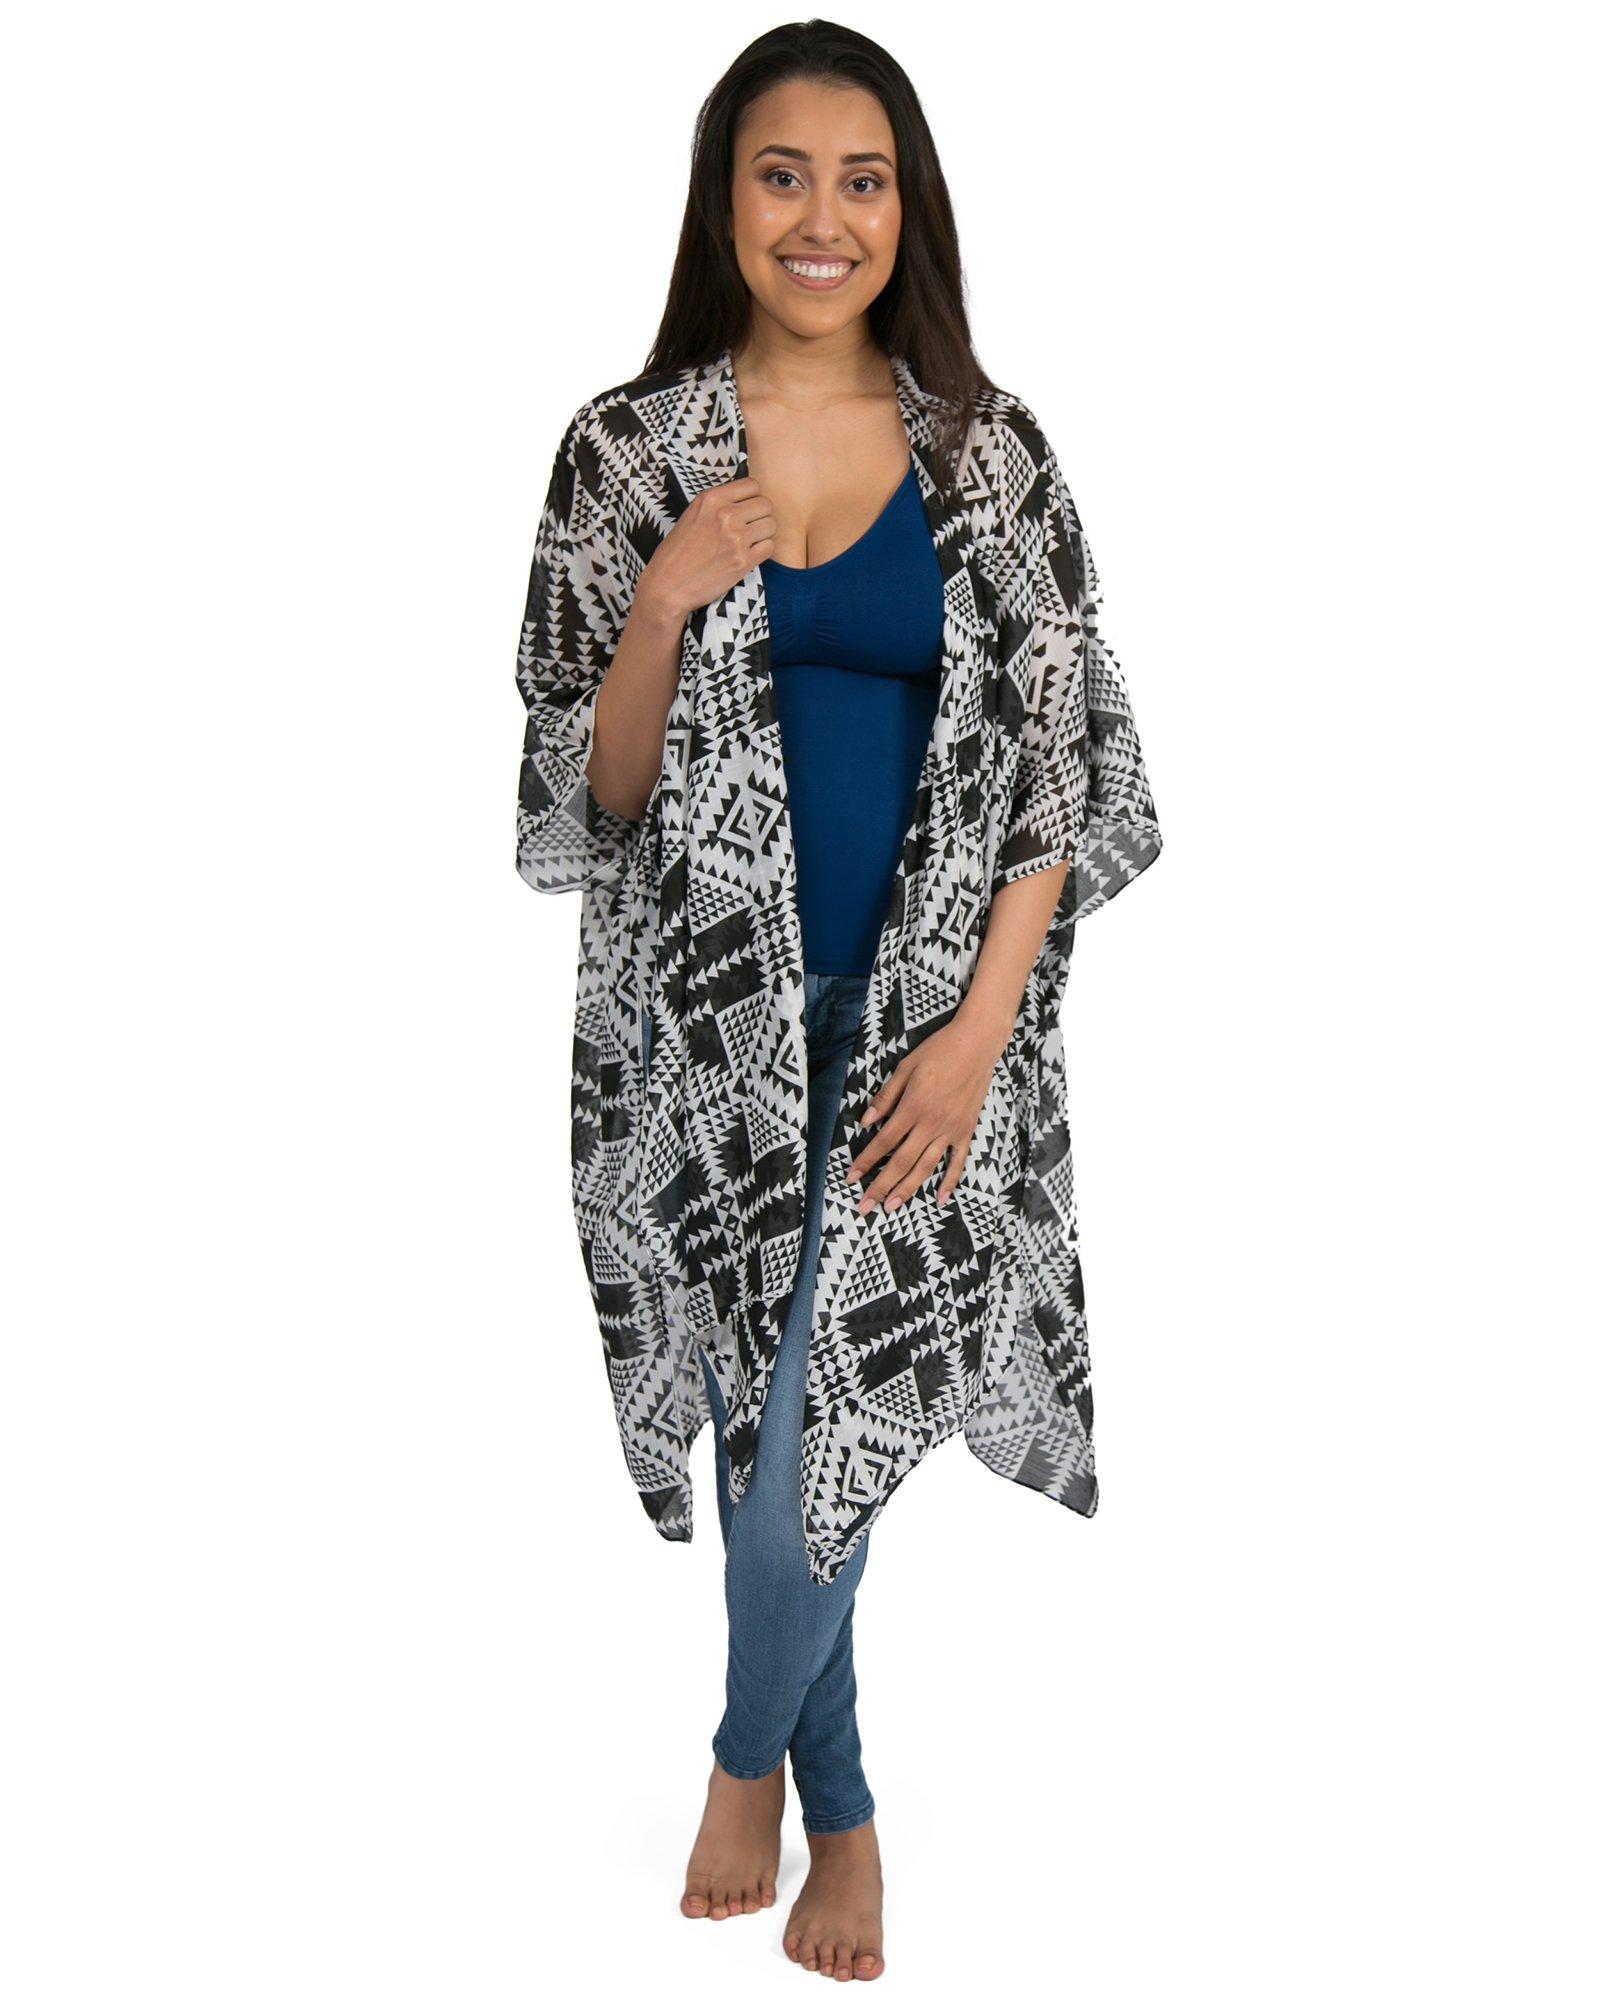 Kindred Bravely Sheer Cardigan Nursing Wrap & Kimono (Black & White Geo Print, One Size)